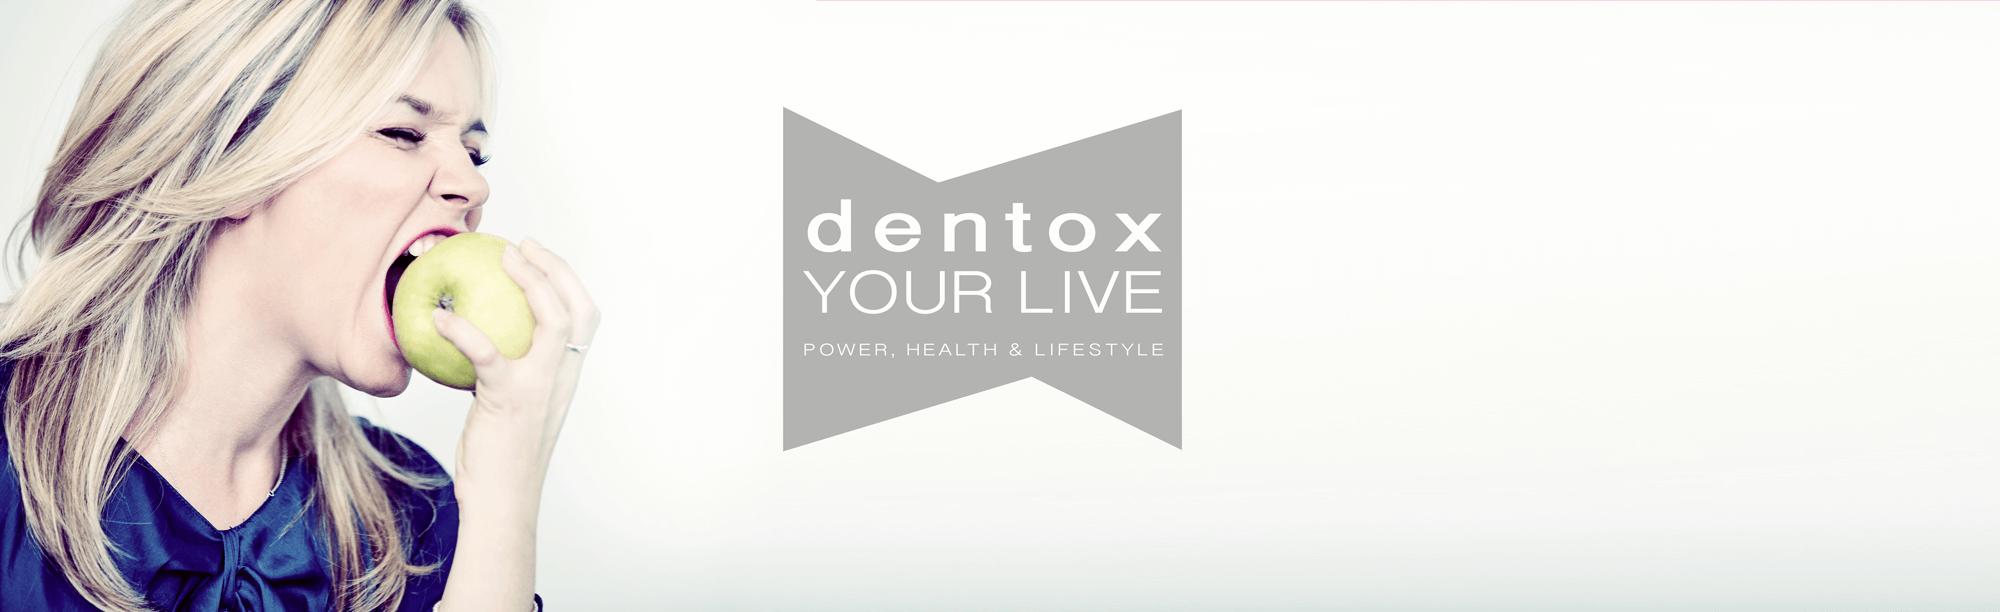 _MG_9072_dentox-your-life